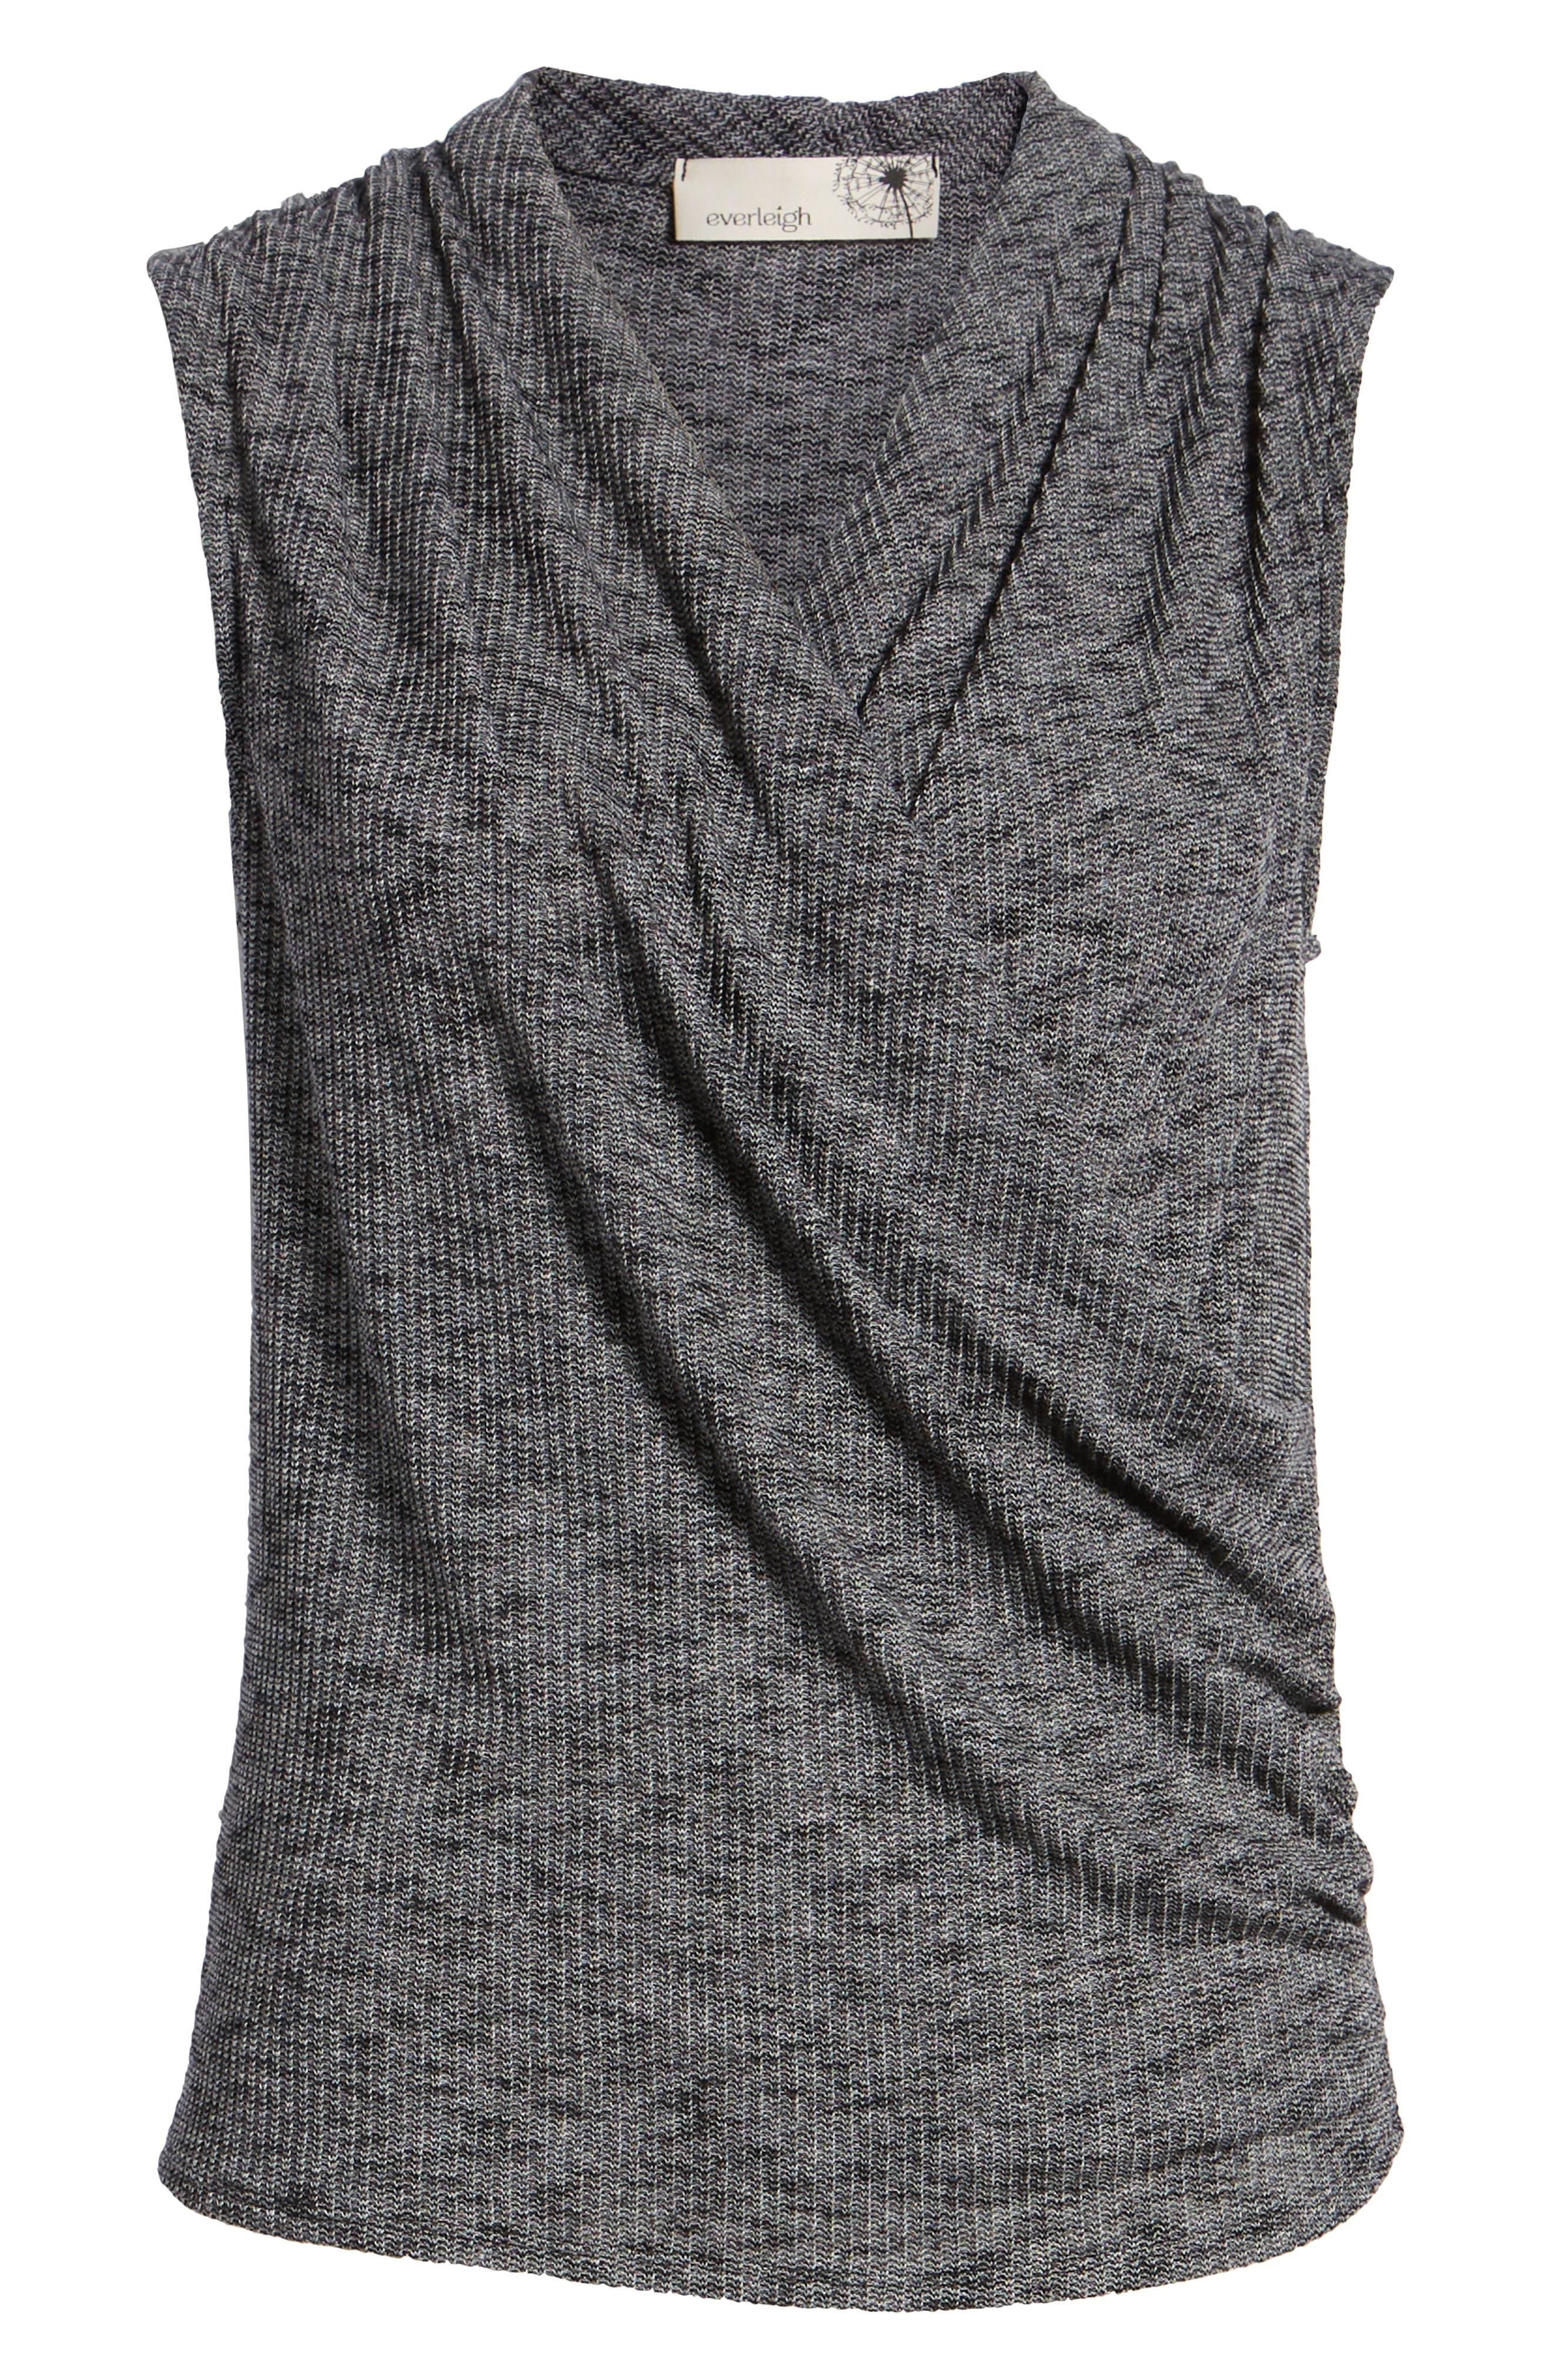 Surplus Knit Sleeveless Top,                             Alternate thumbnail 6, color,                             001